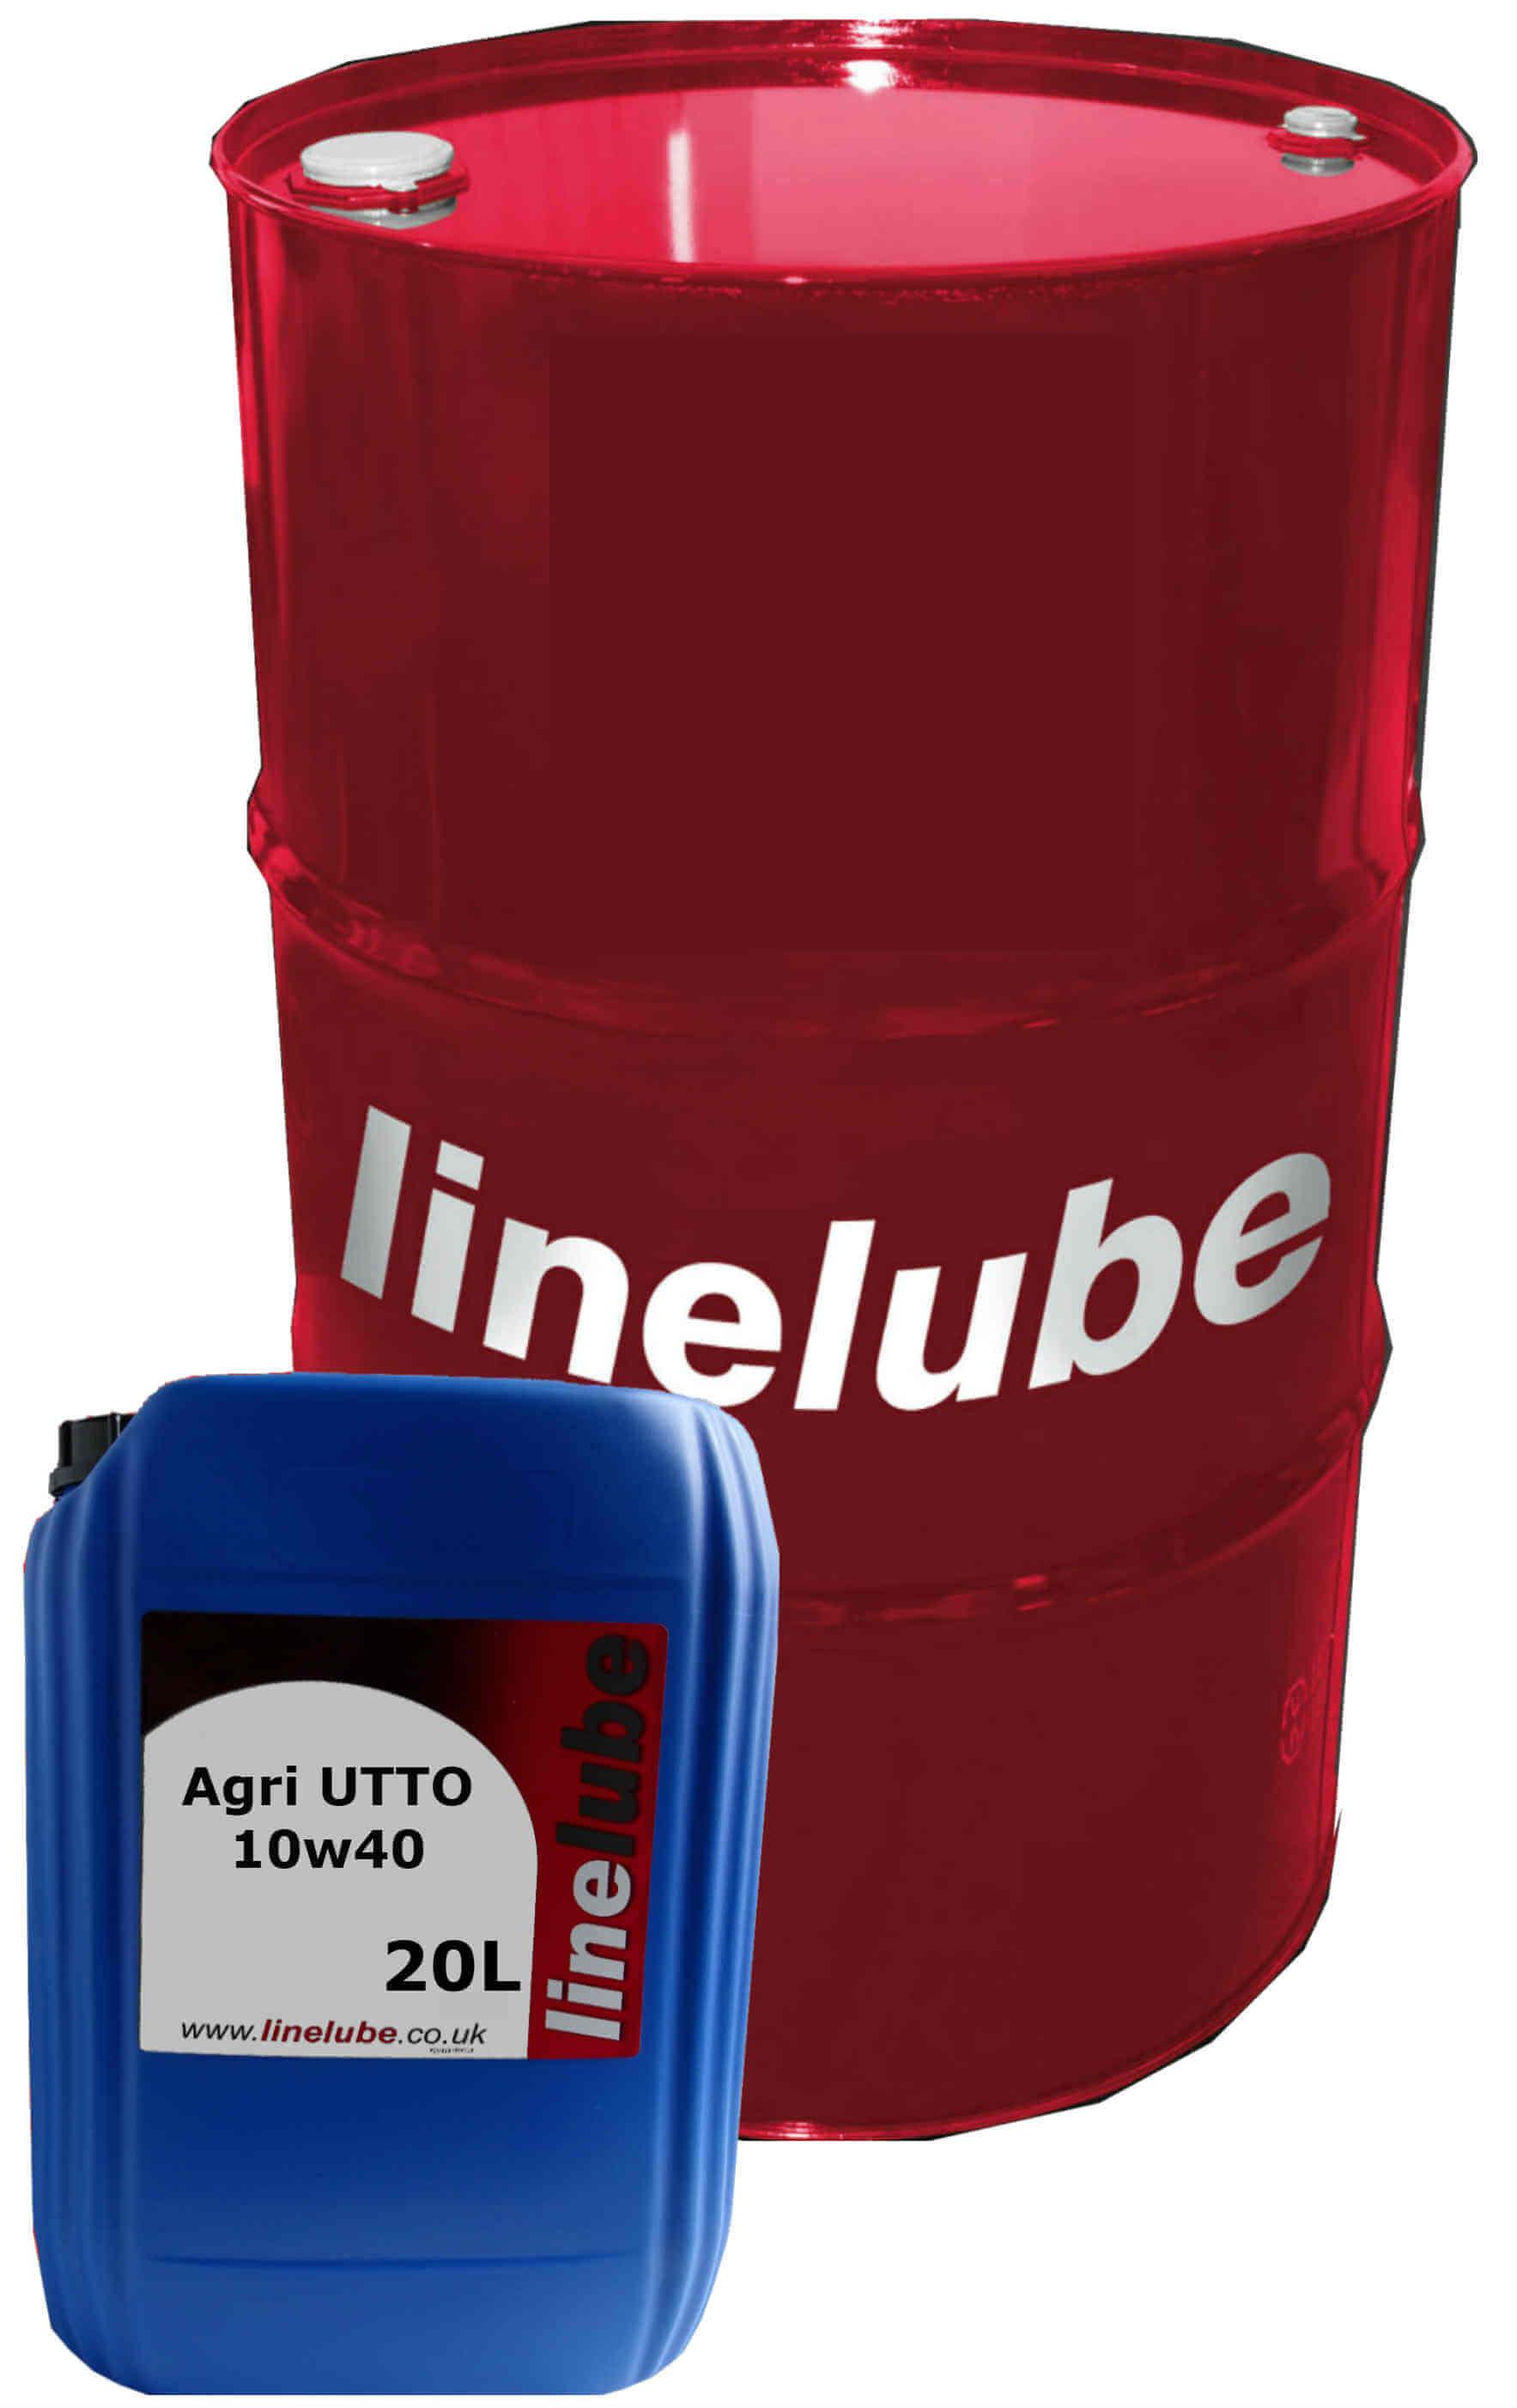 linelube Agri UTTO 10W-40